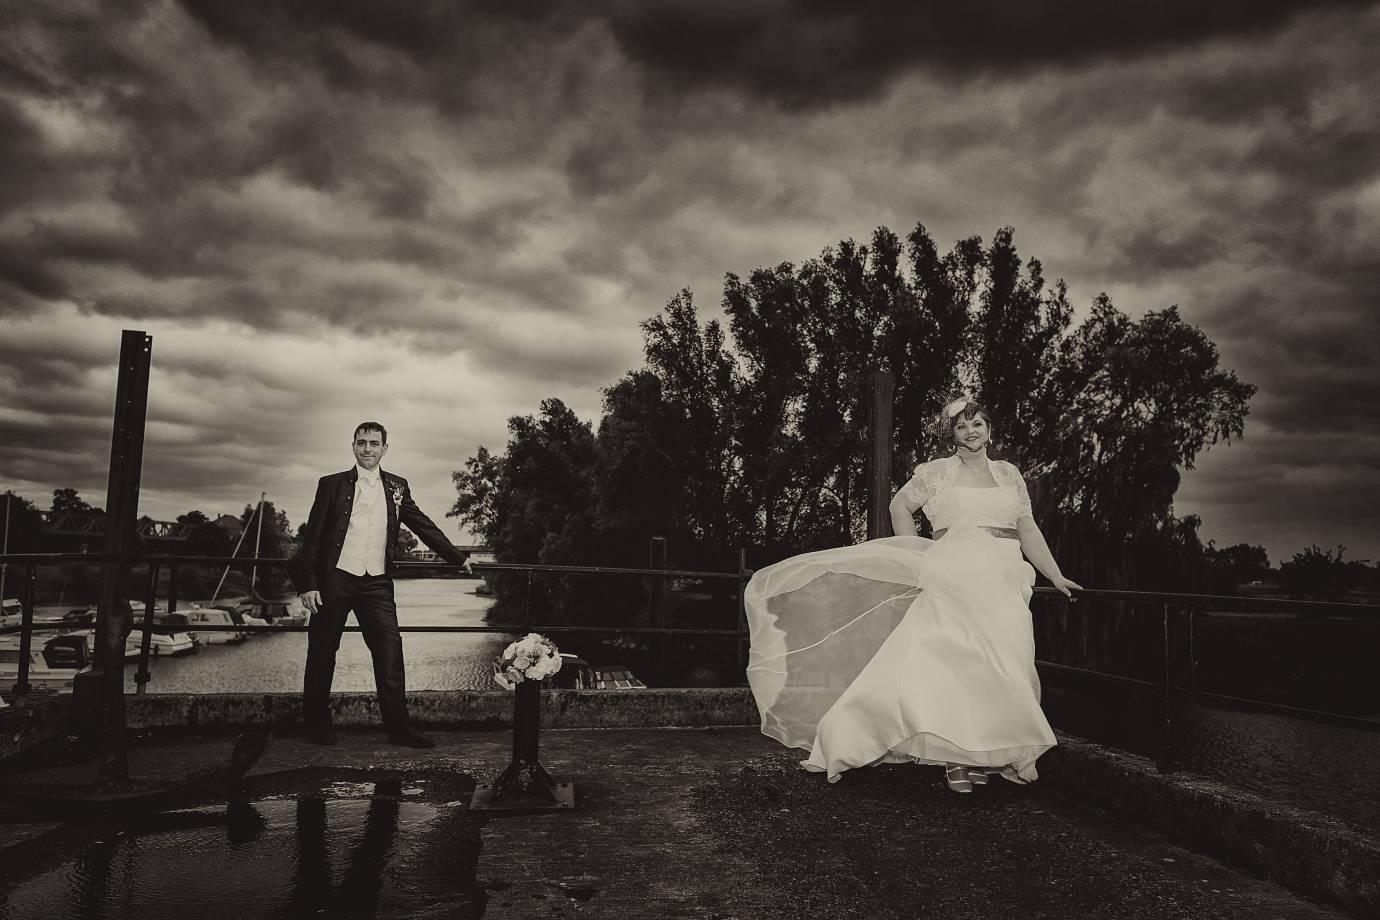 hochzeitsfotograf achim 095 - Christina+Peter